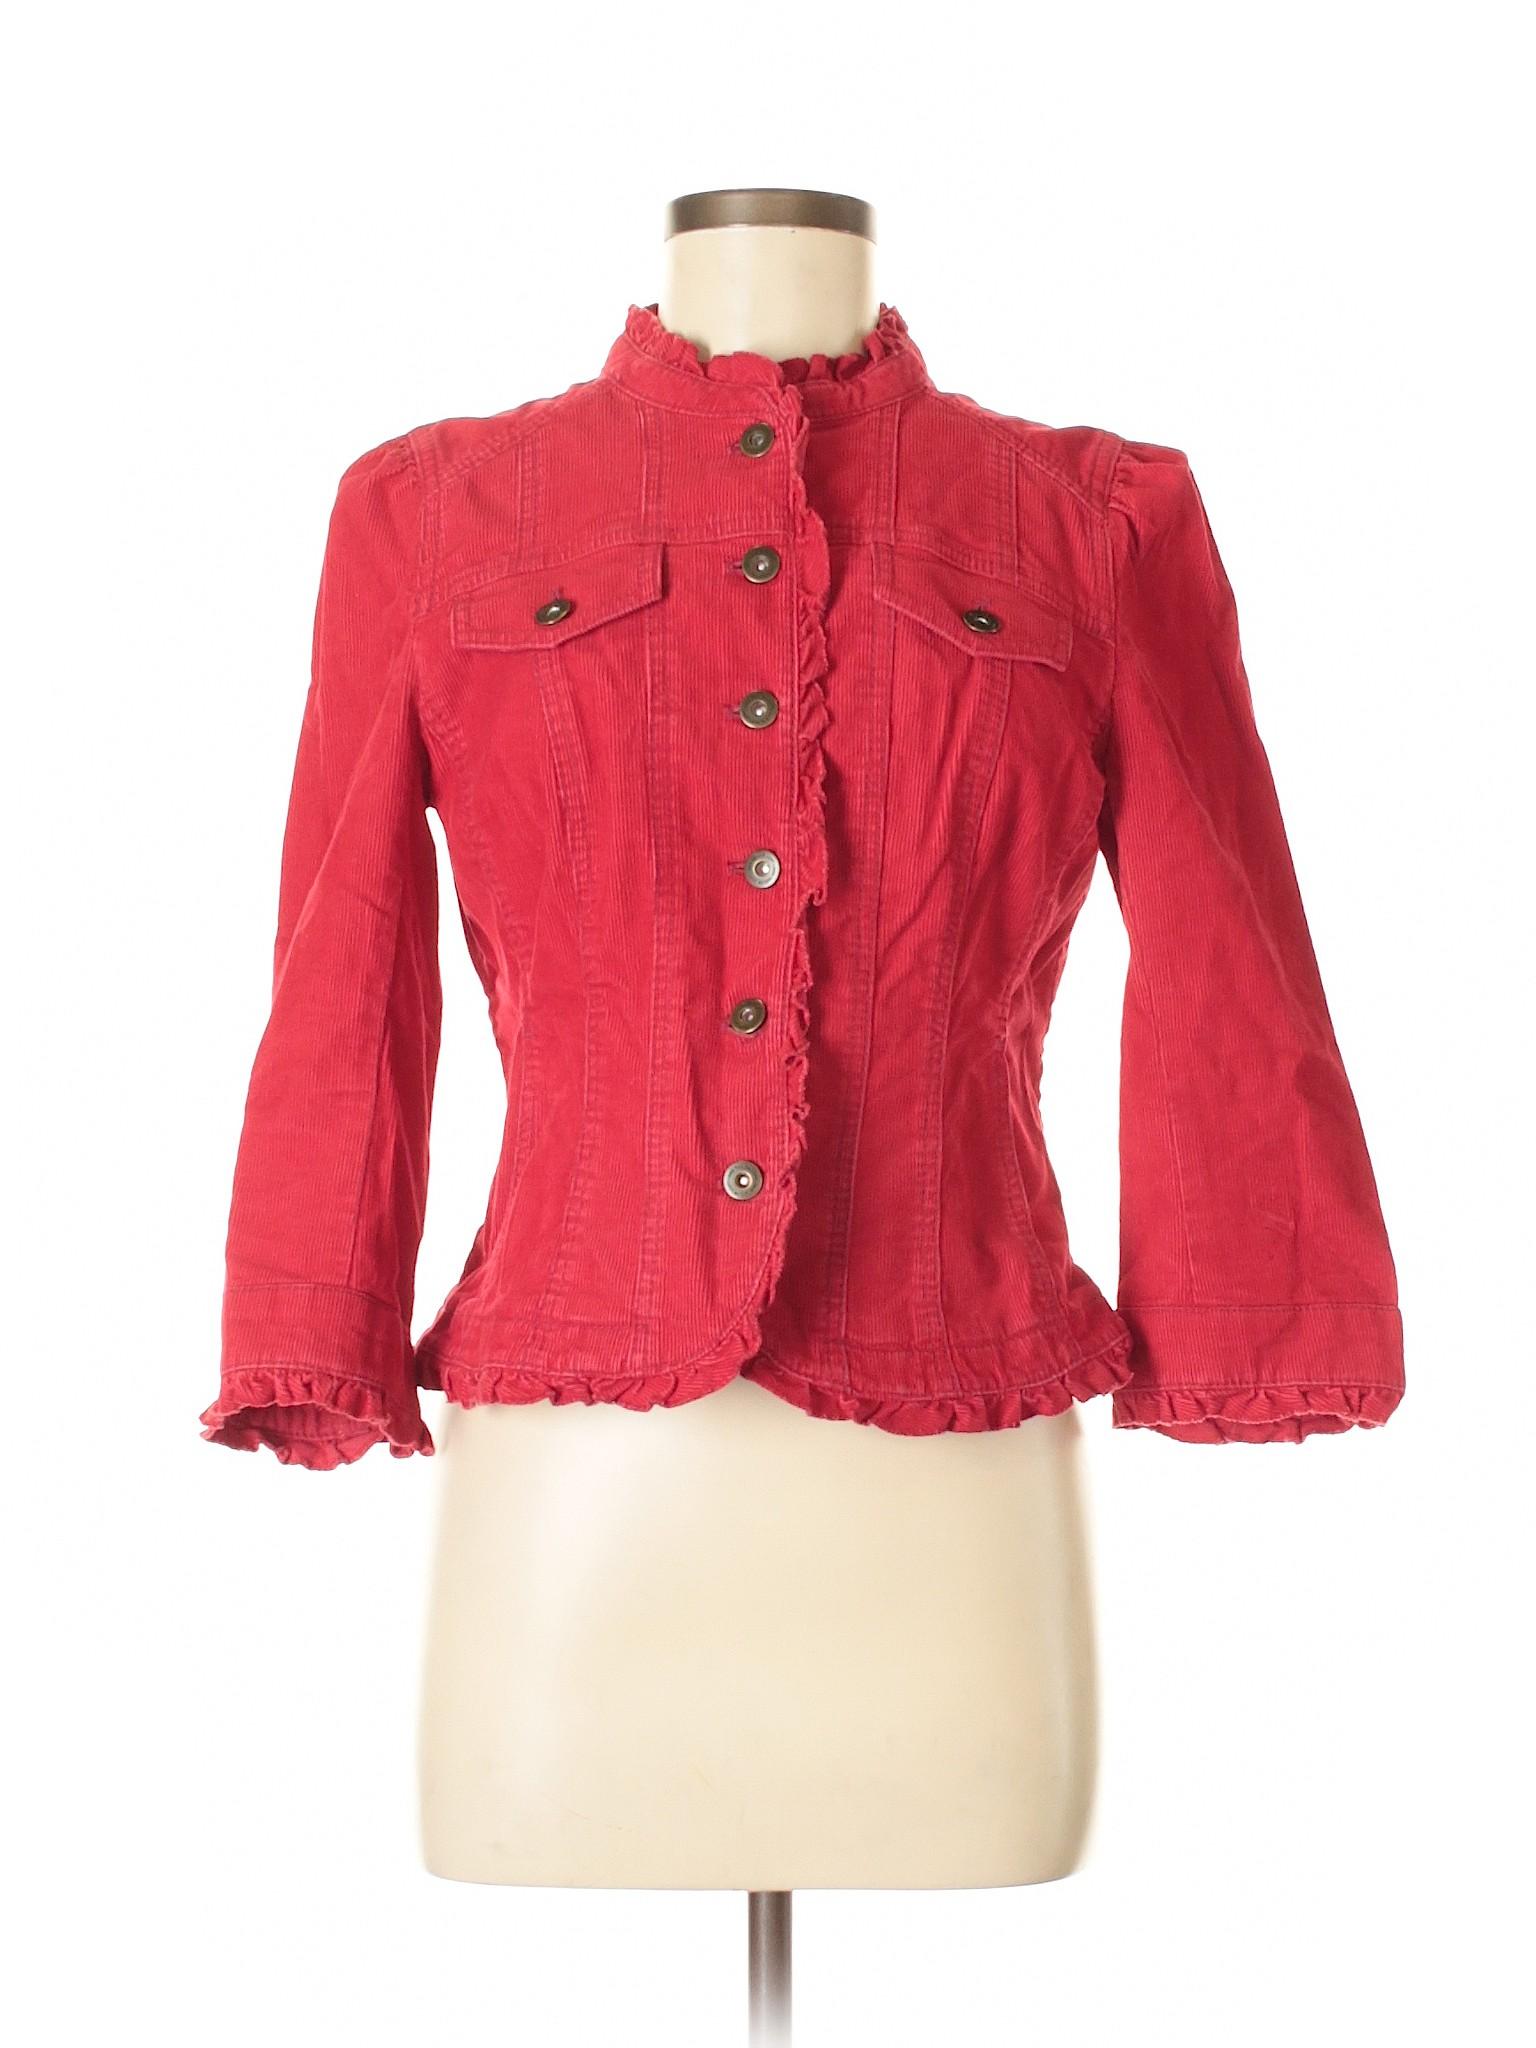 Jacket Denim Boutique LOFT Ann Taylor pqw10I